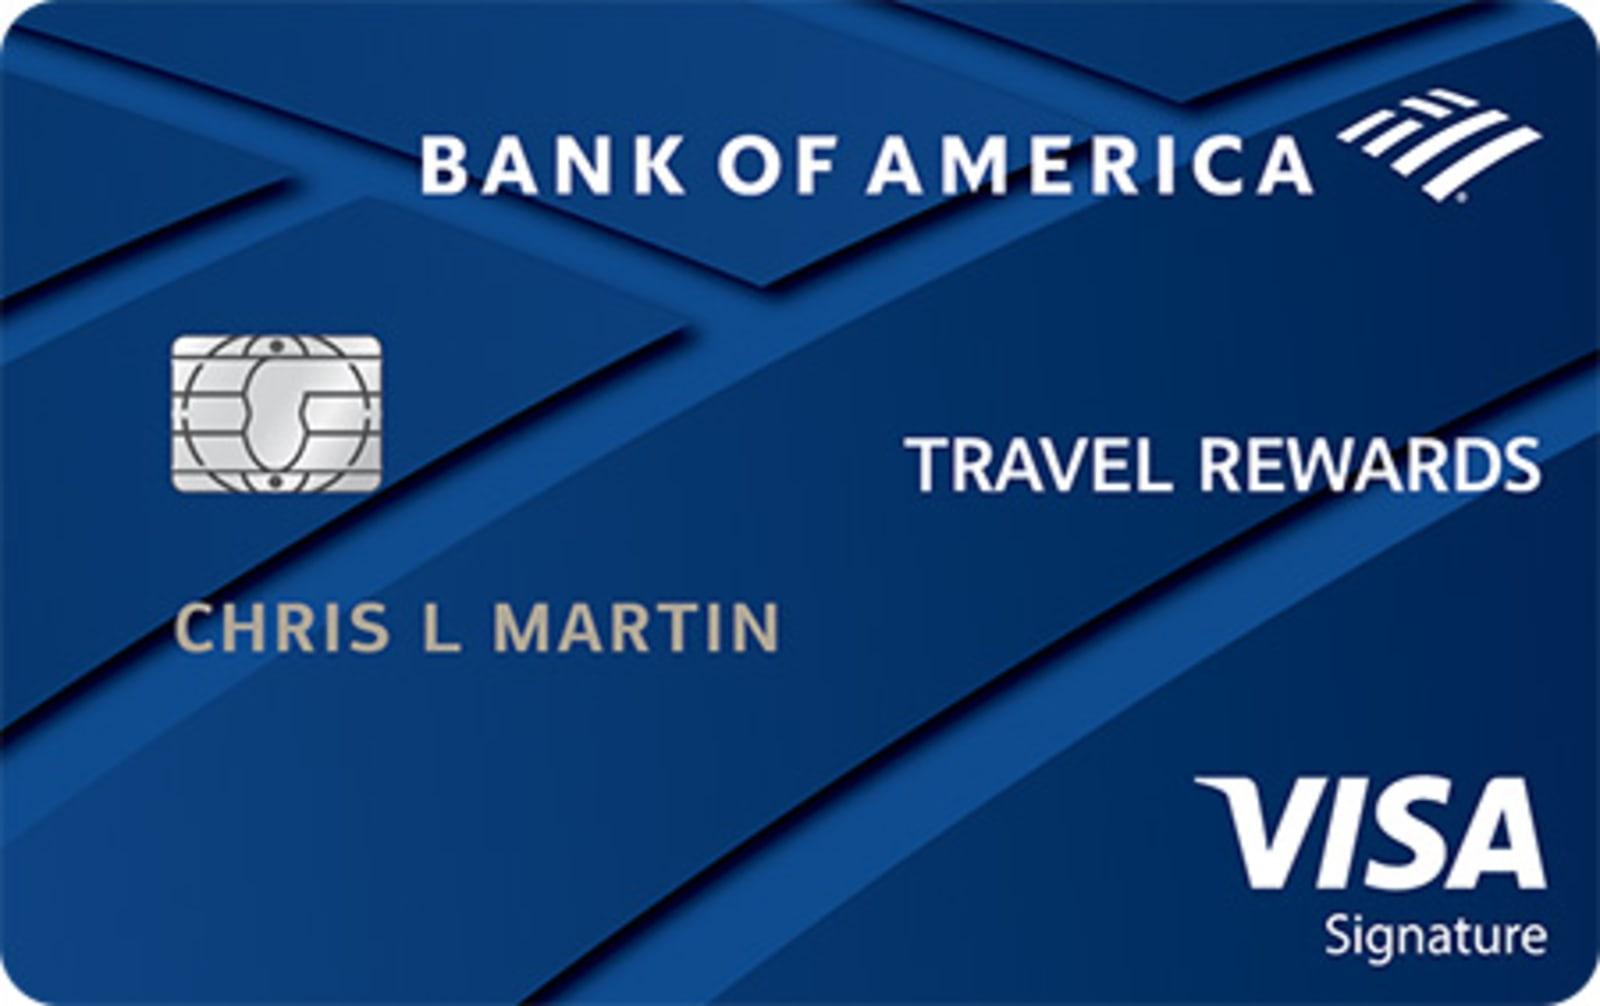 bank of america credit card usage abroad